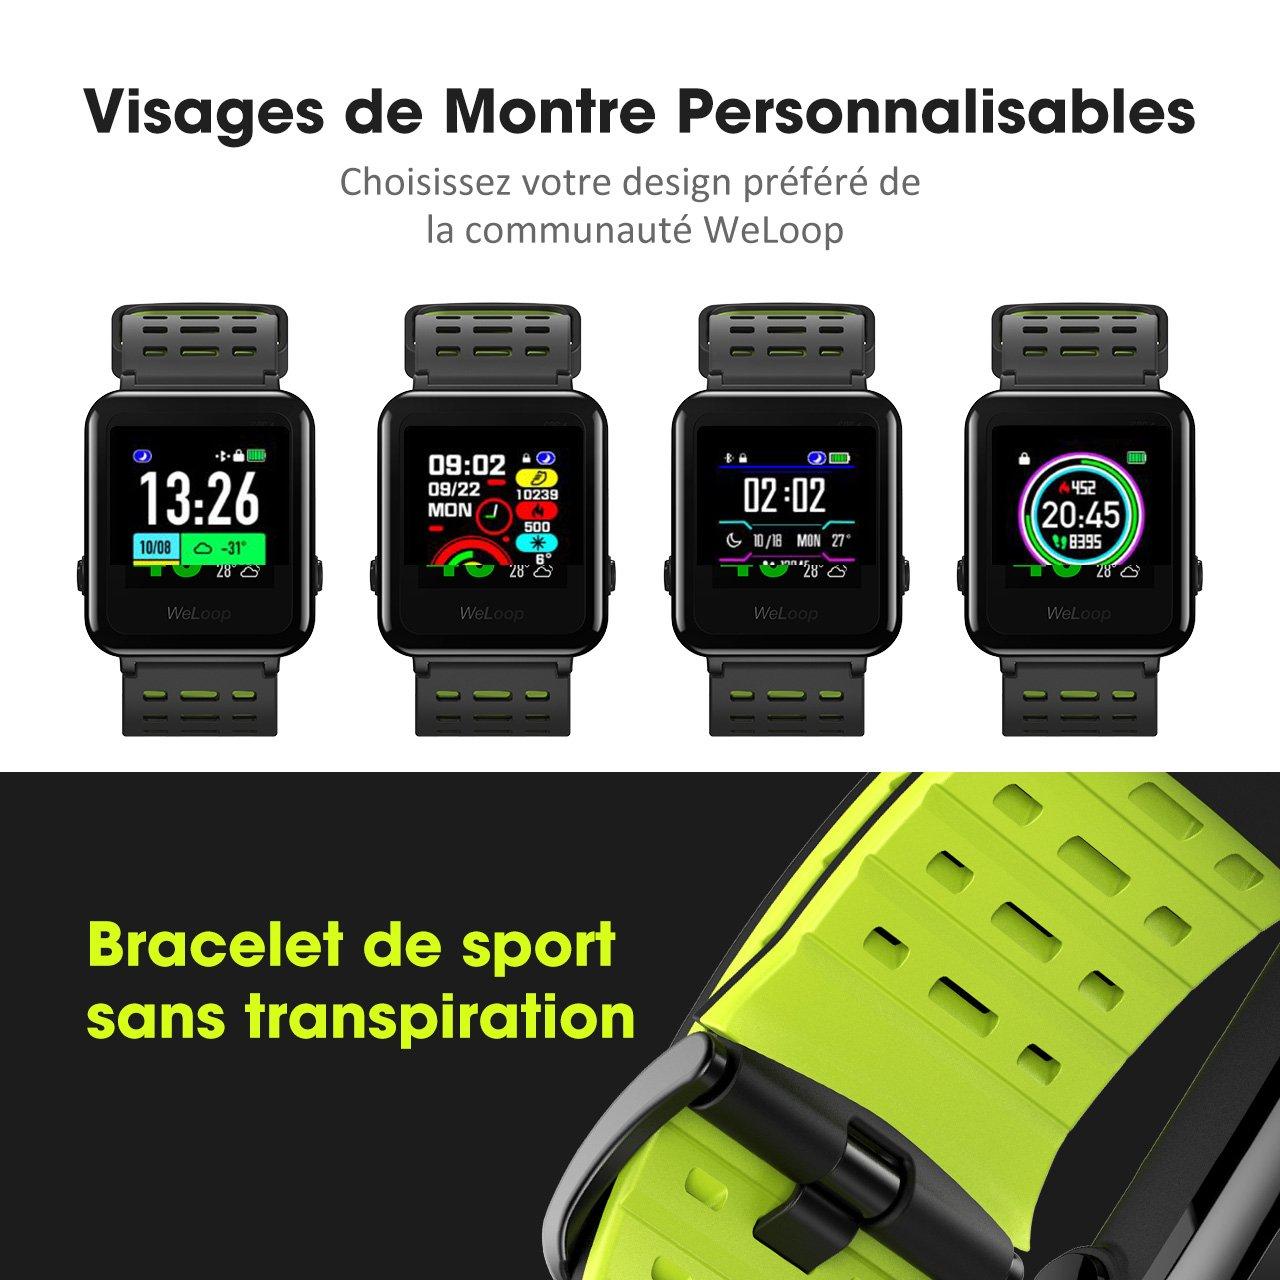 omorc - Reloj inteligente, impermeable hasta 5 ATM, con GPS, cronómetro, pulsómetro, para Fitness, Rastreador, Bluetooth 4.0, con fondos de reloj ...